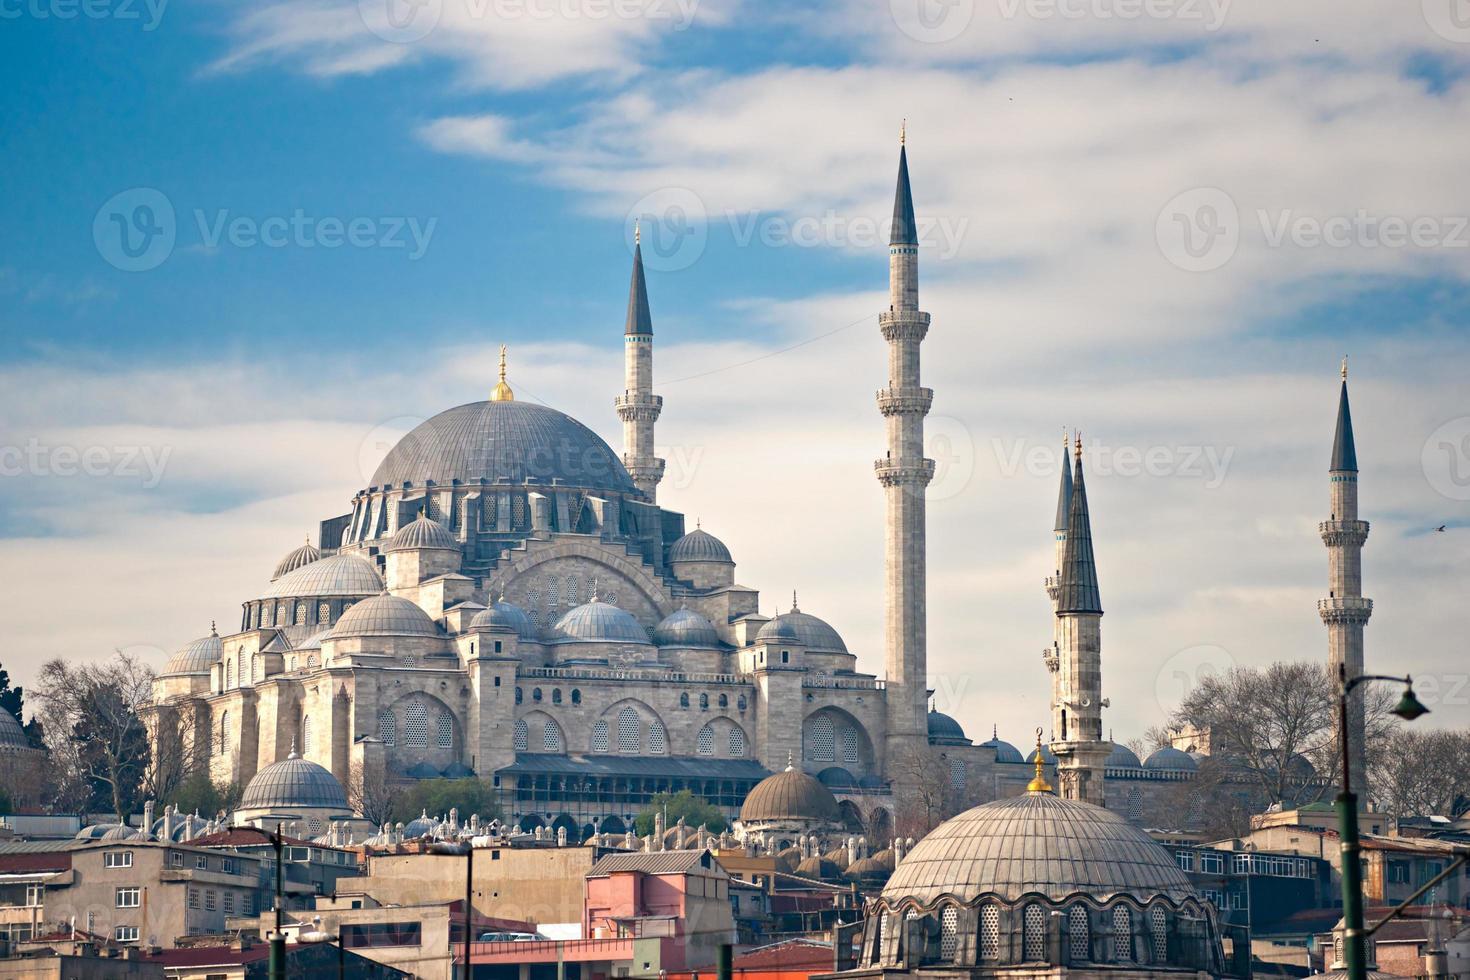 la moschea suleymanie (distretto di Fatih). Istanbul. foto